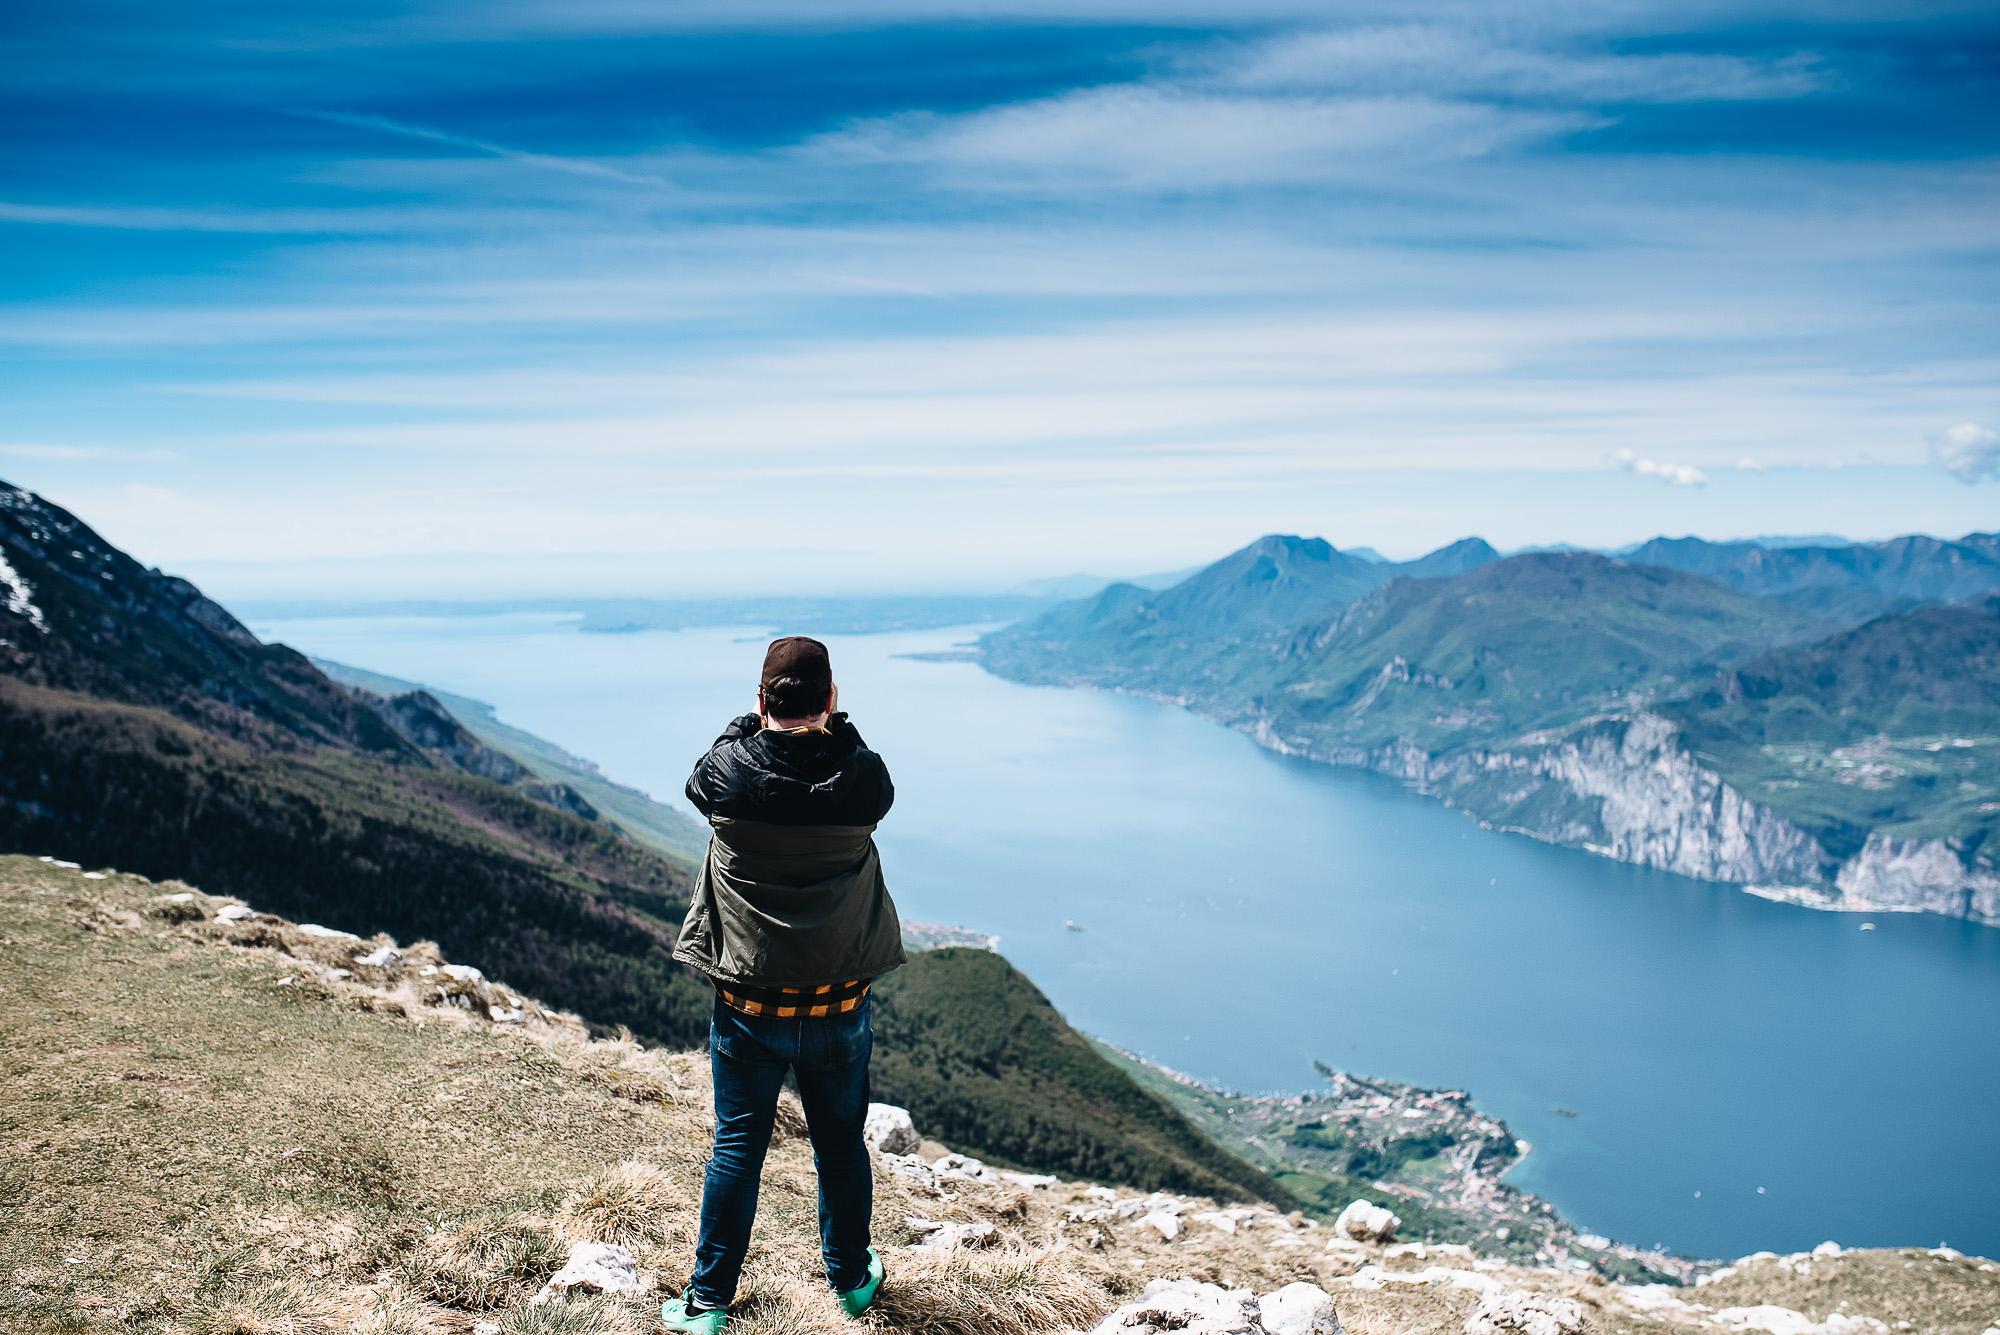 OurBeautifulAdventure-LakeGarda-Italy-Blog-1161.jpg